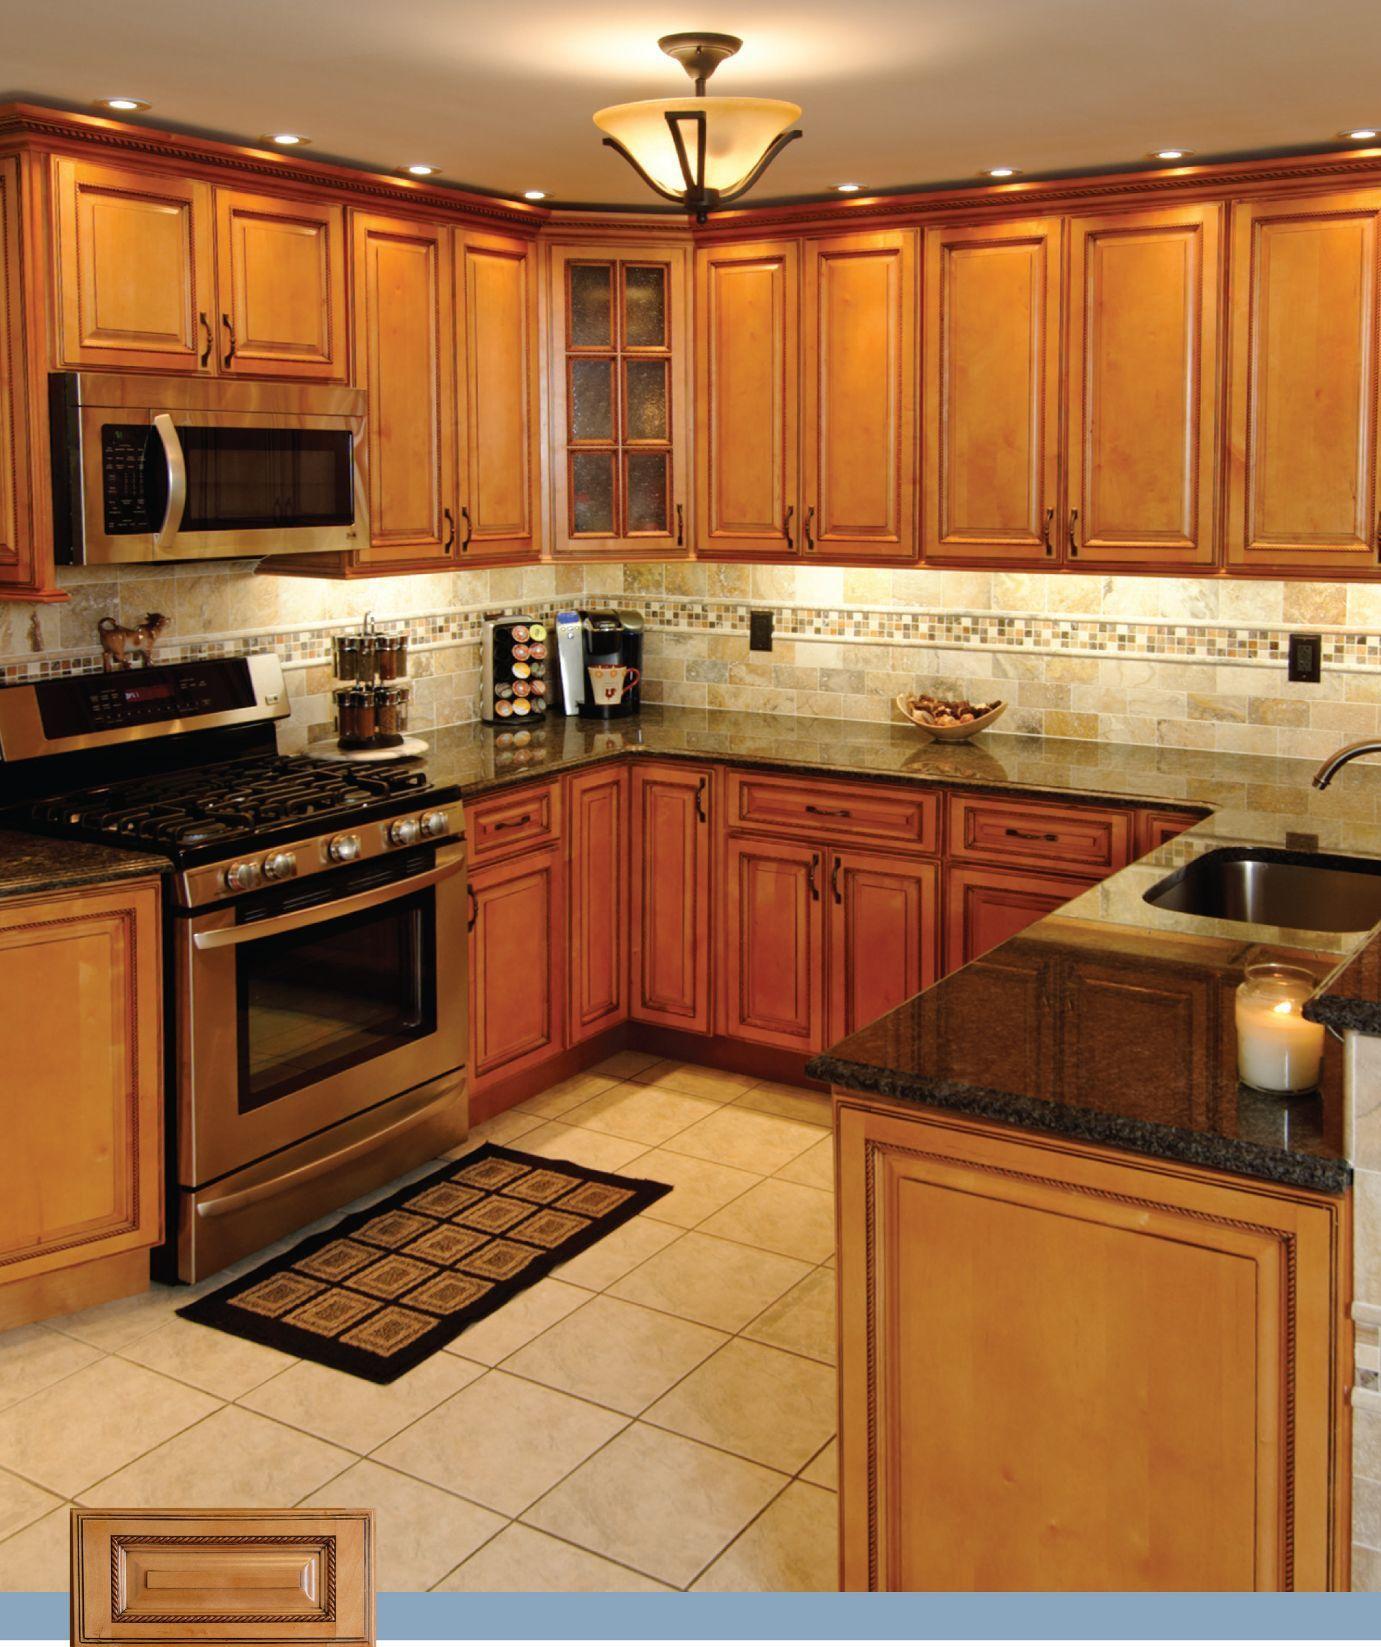 Kitchen Cabinets Rta Remodels Under 5000 Kcd Light Caramel Rope Cabinet Mid Century Modern Decor Furniture